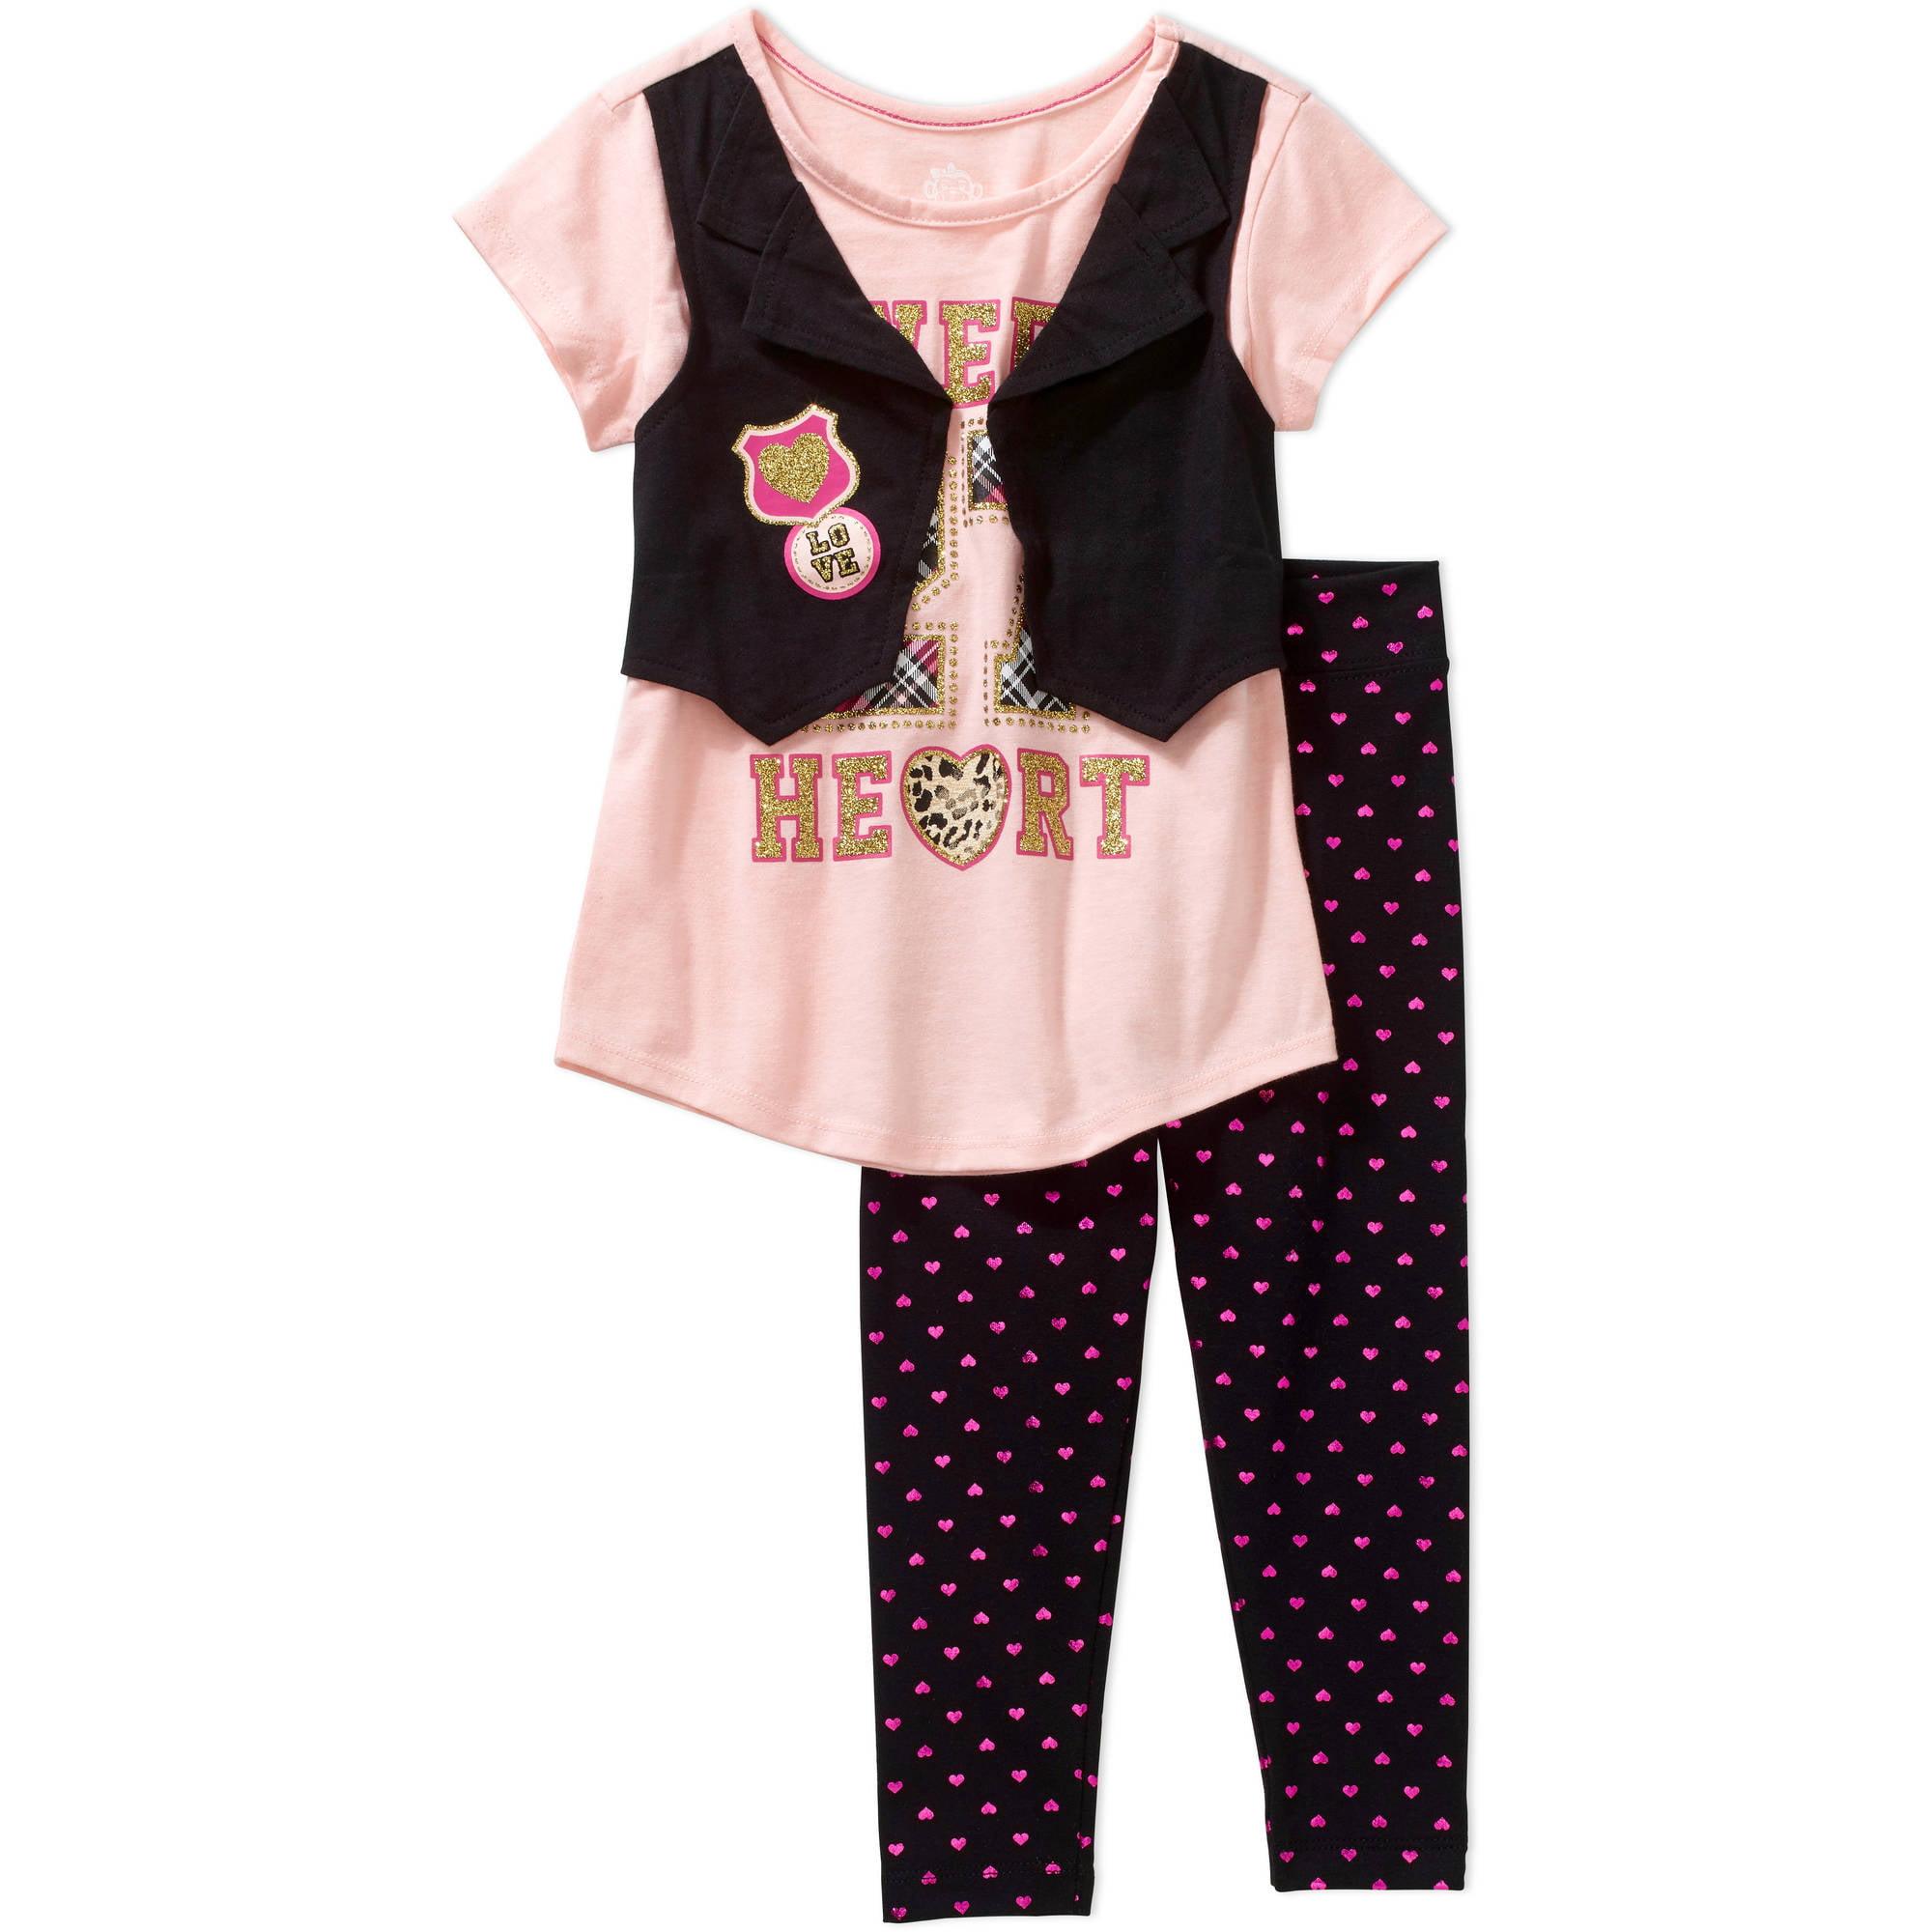 365 Kids from Garanimals Girls' Short Sleeve Twofer Vest Tee and Foil Print Legging, Outfit Set